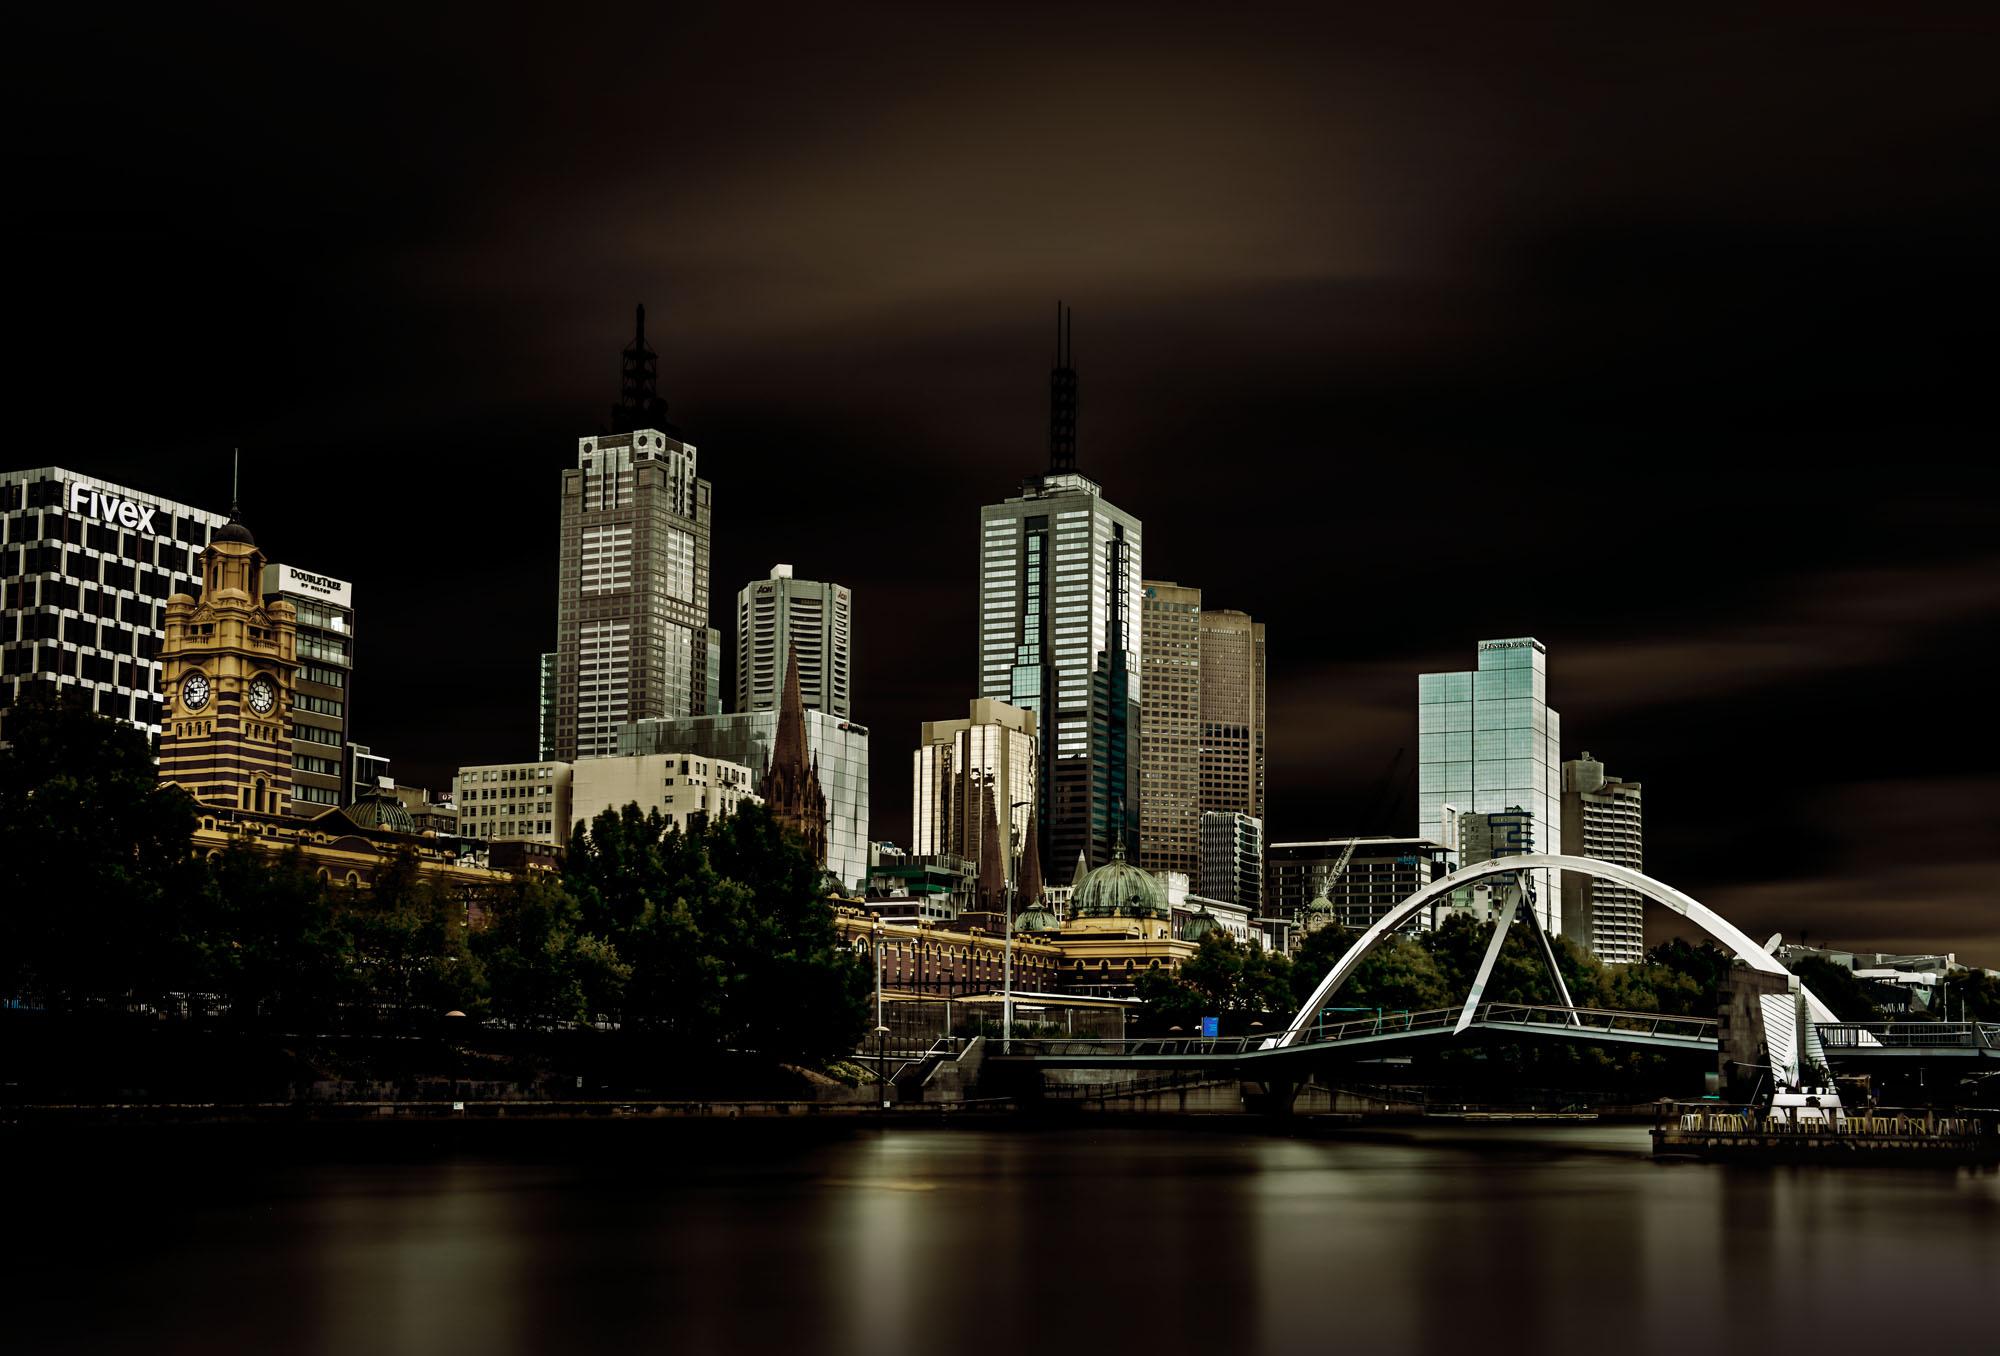 7-leanne-cole-melbourne-australia.jpg